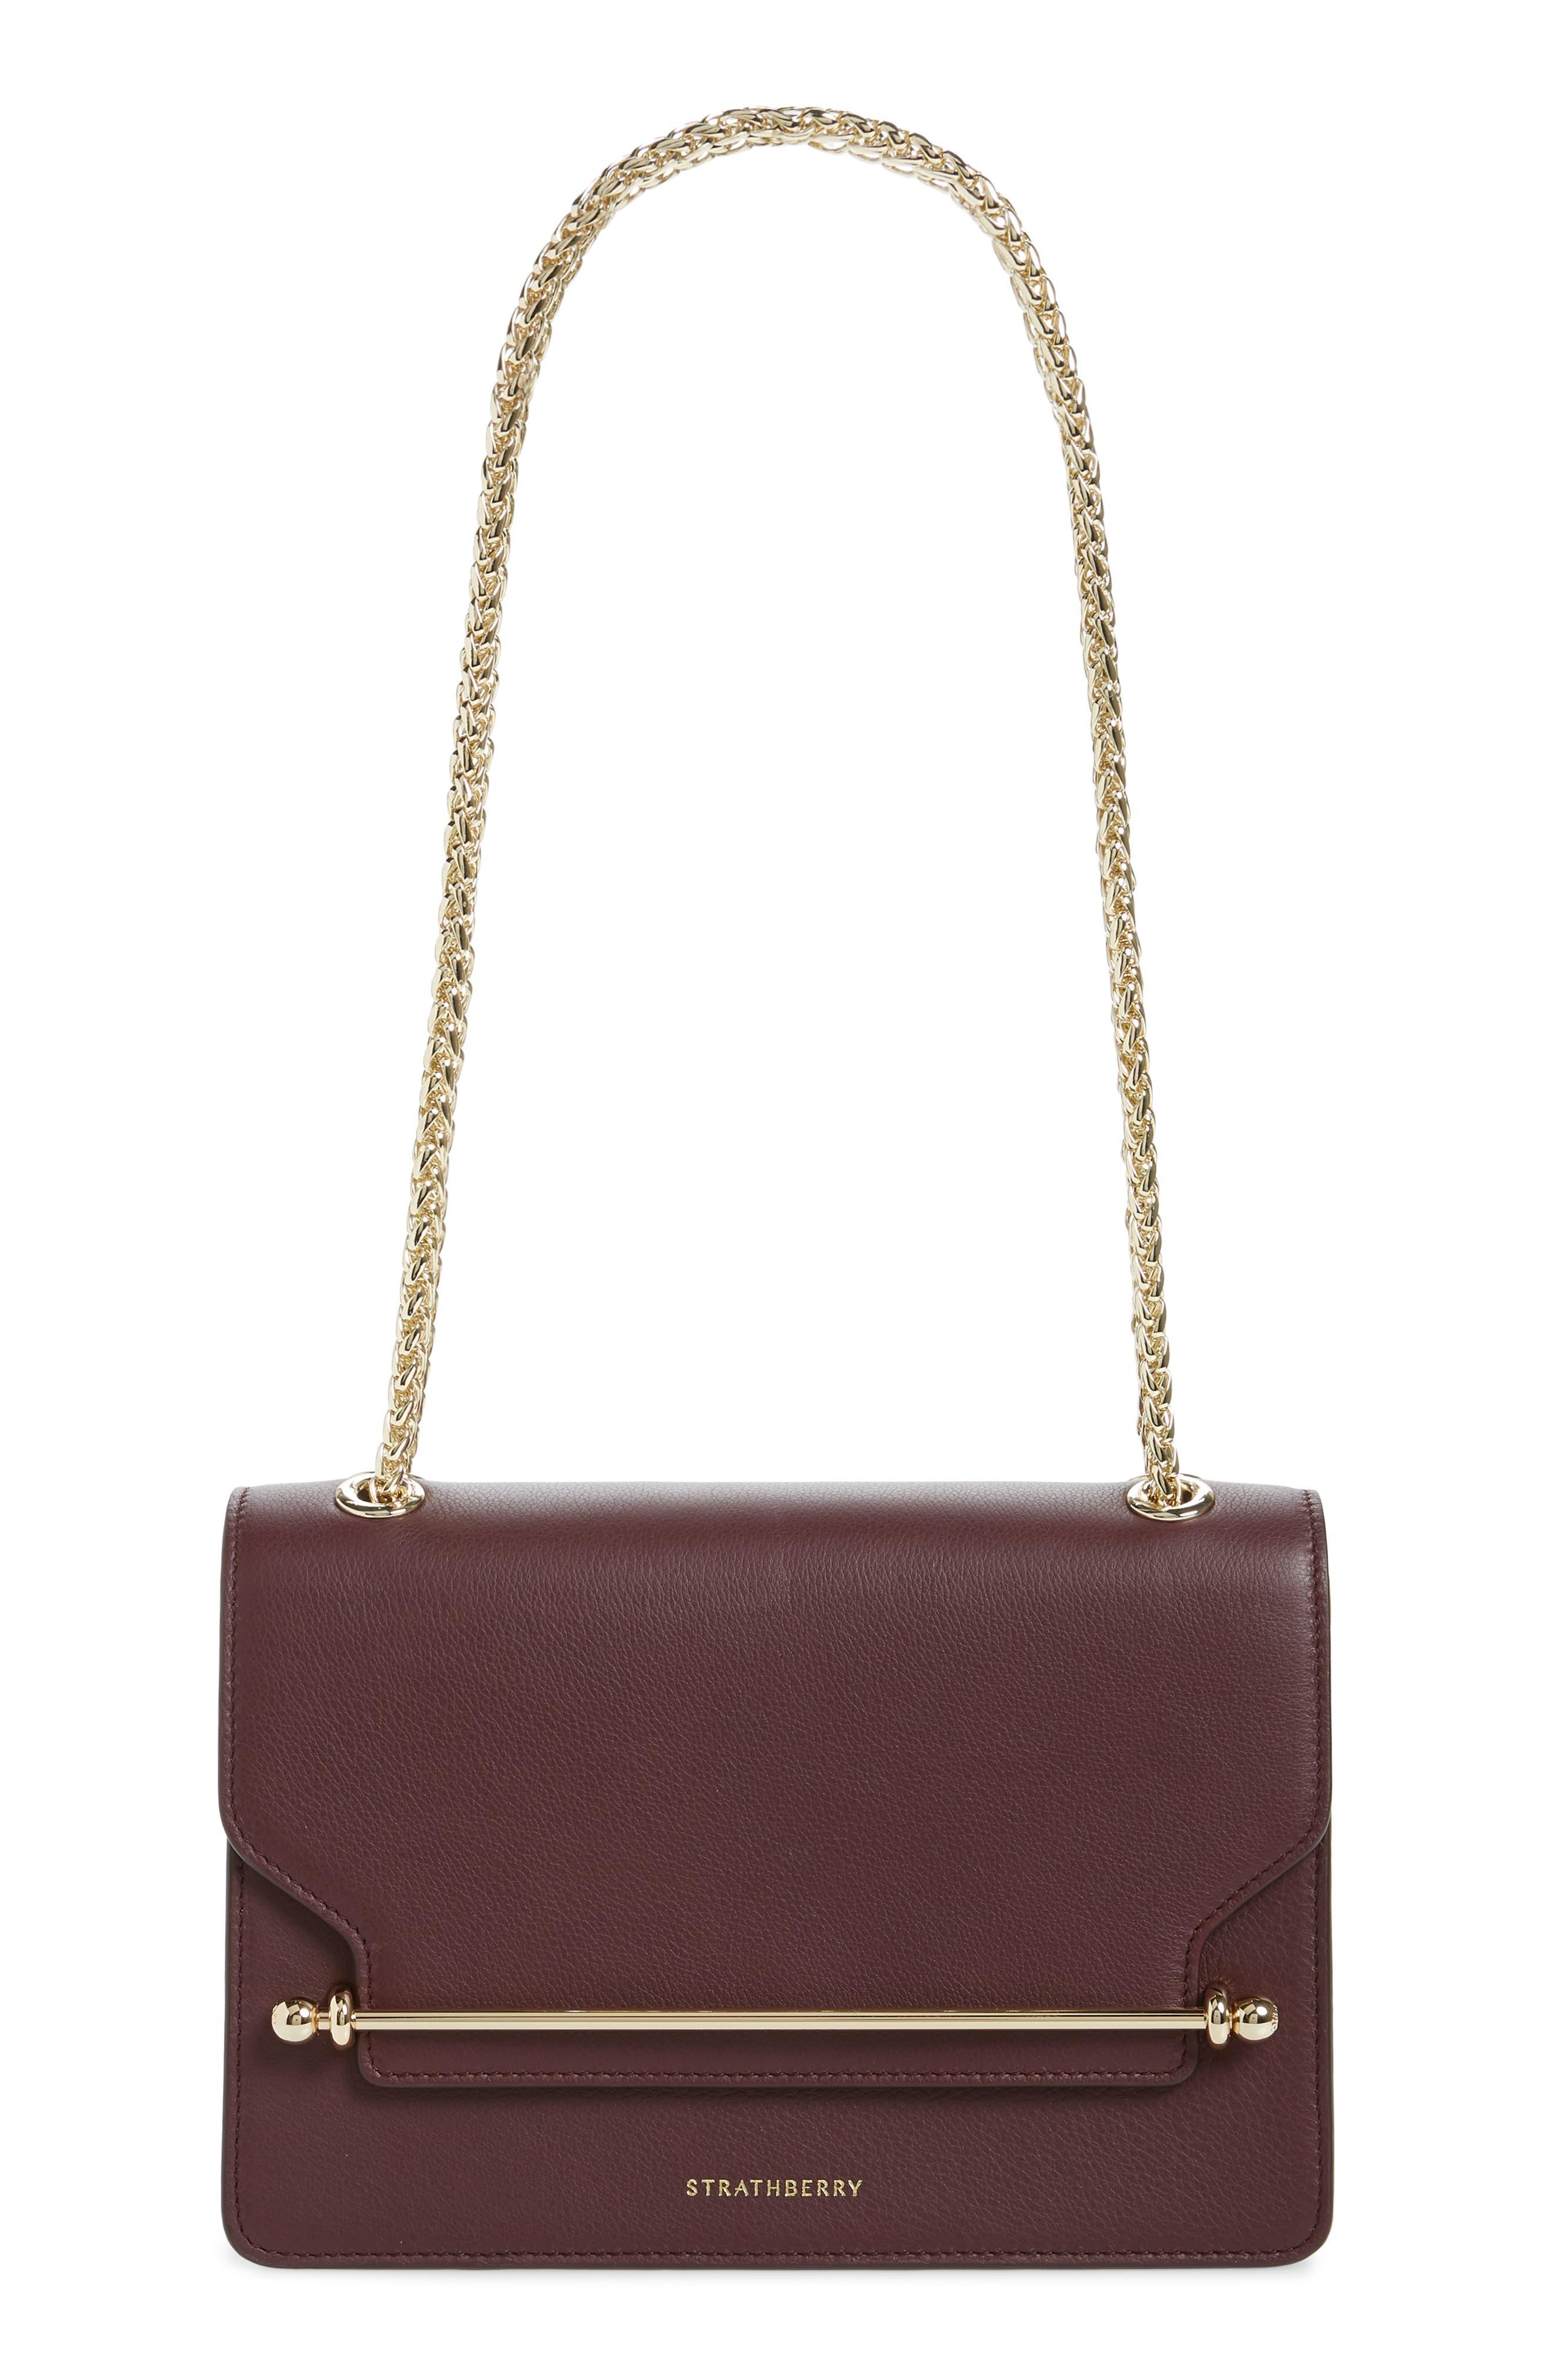 STRATHBERRY East/West Leather Crossbody Bag - Burgundy